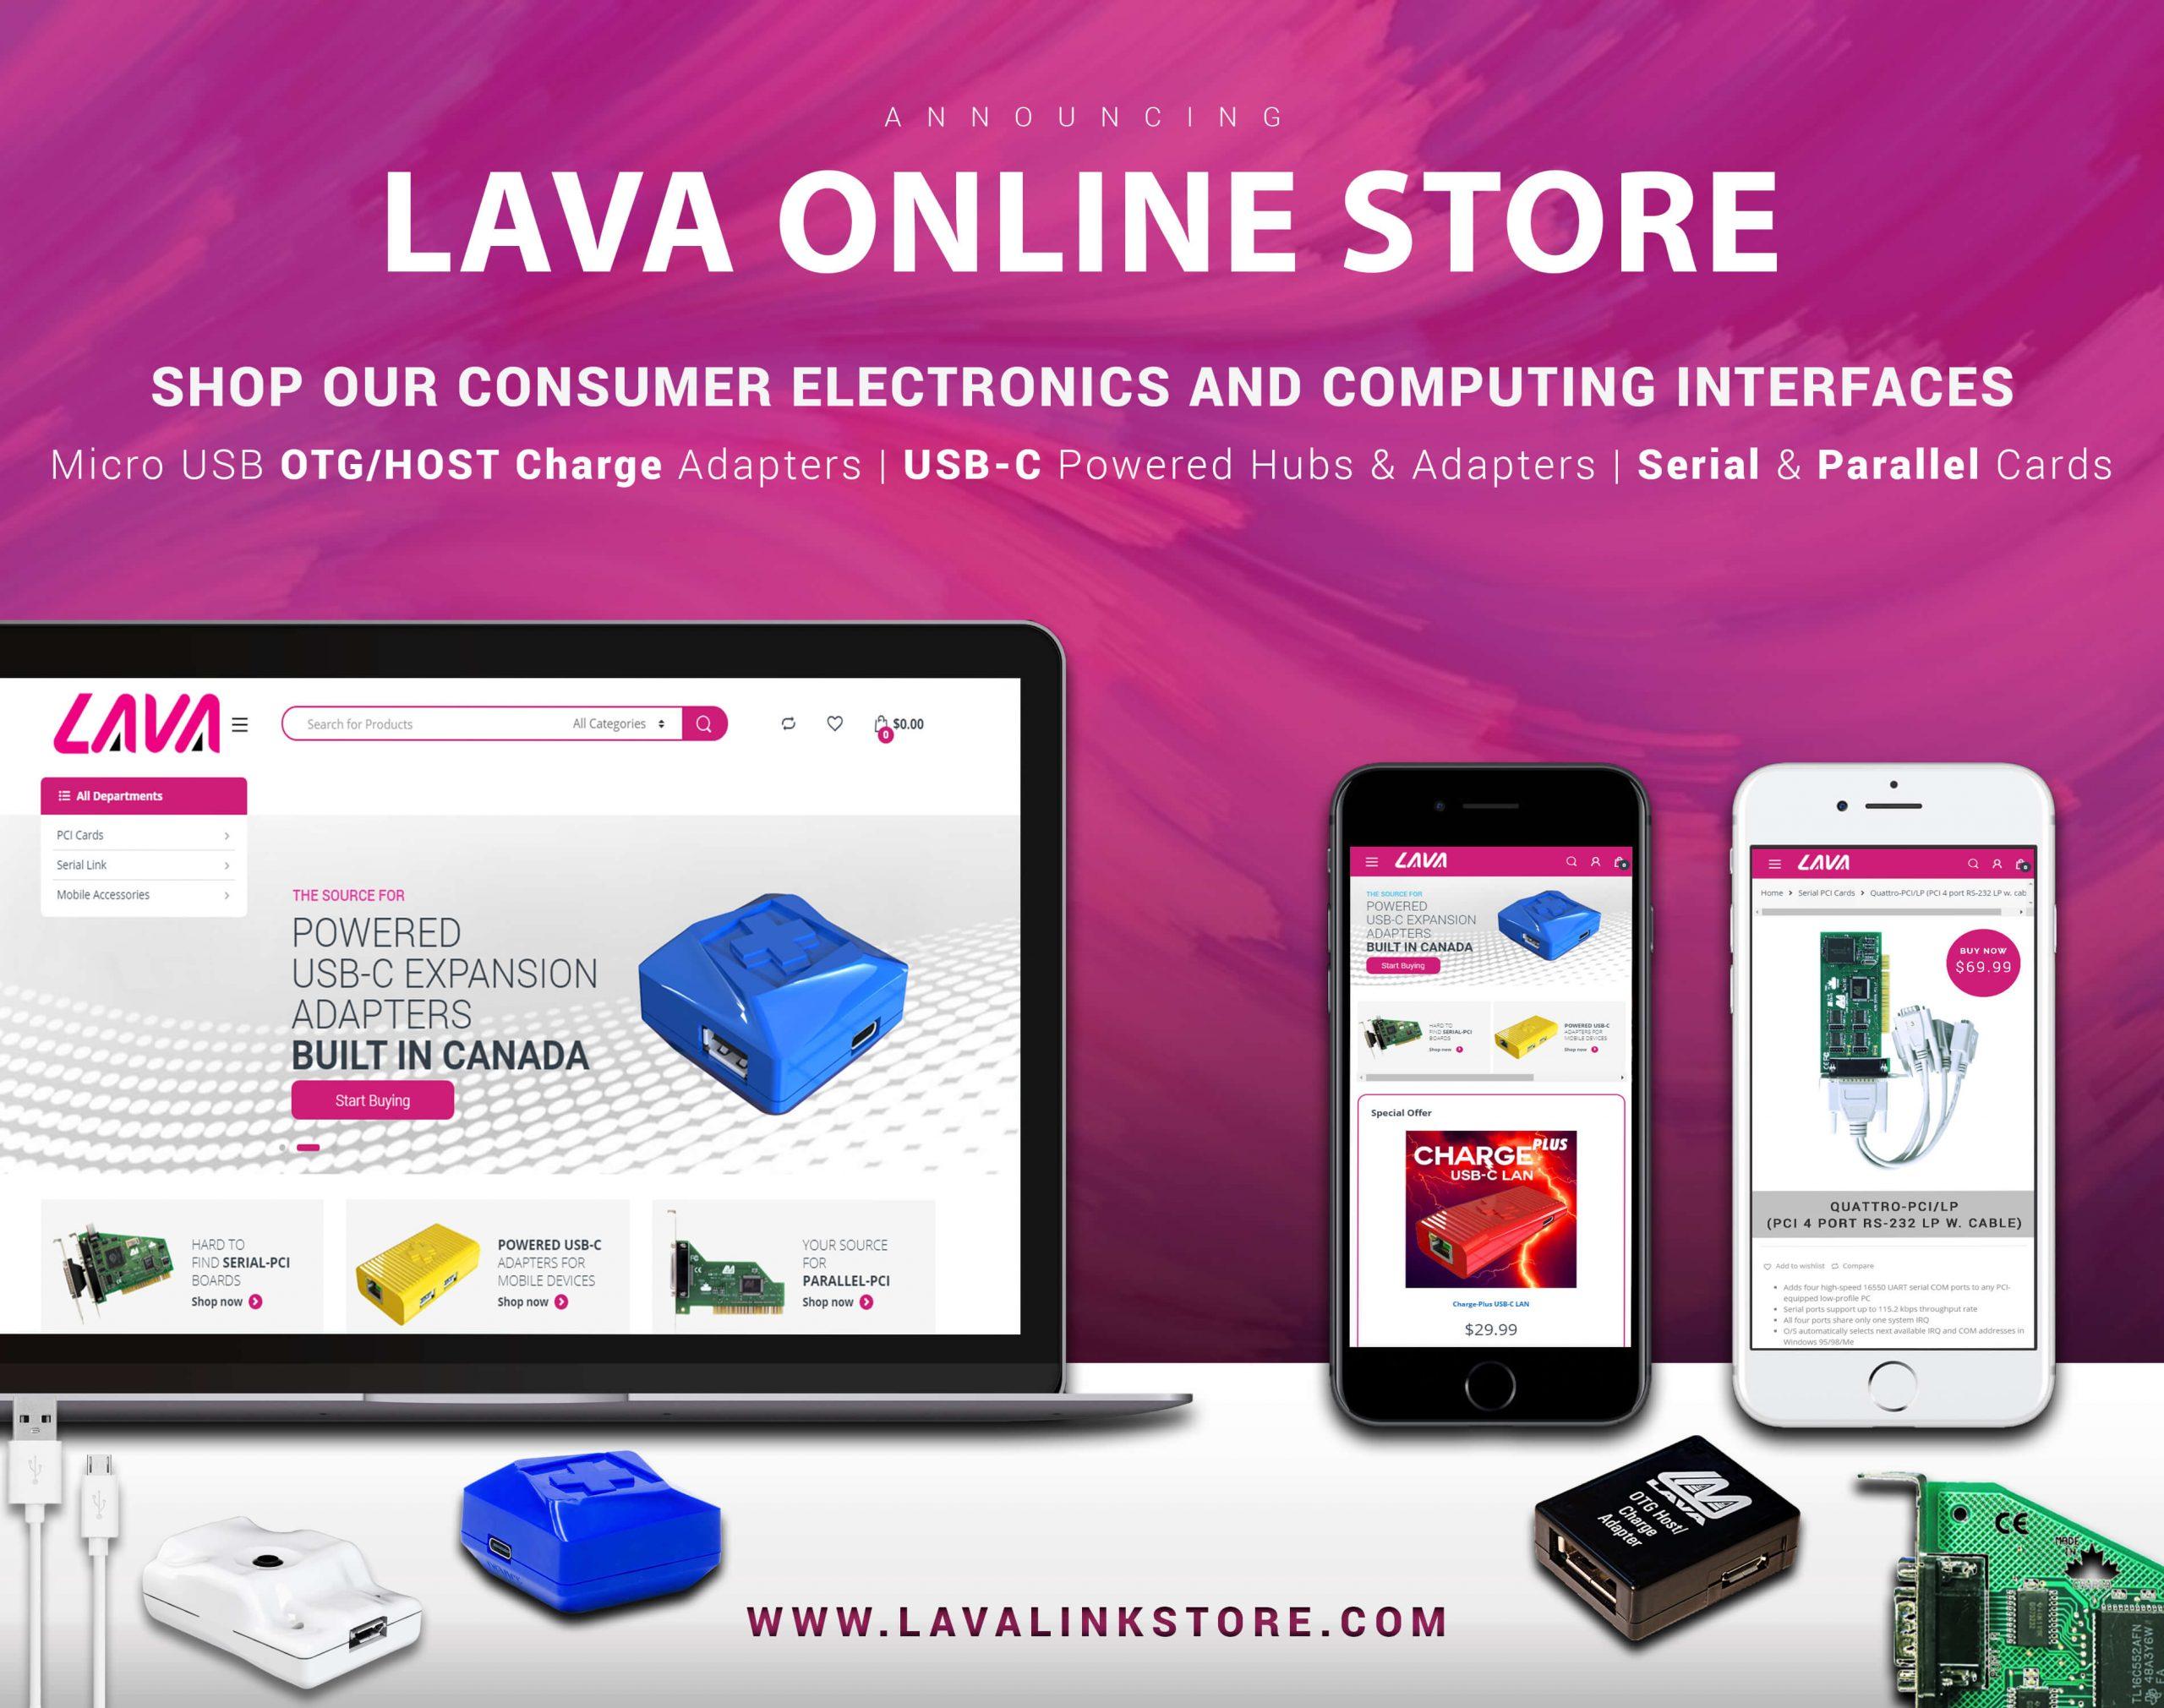 LAVA Online Store